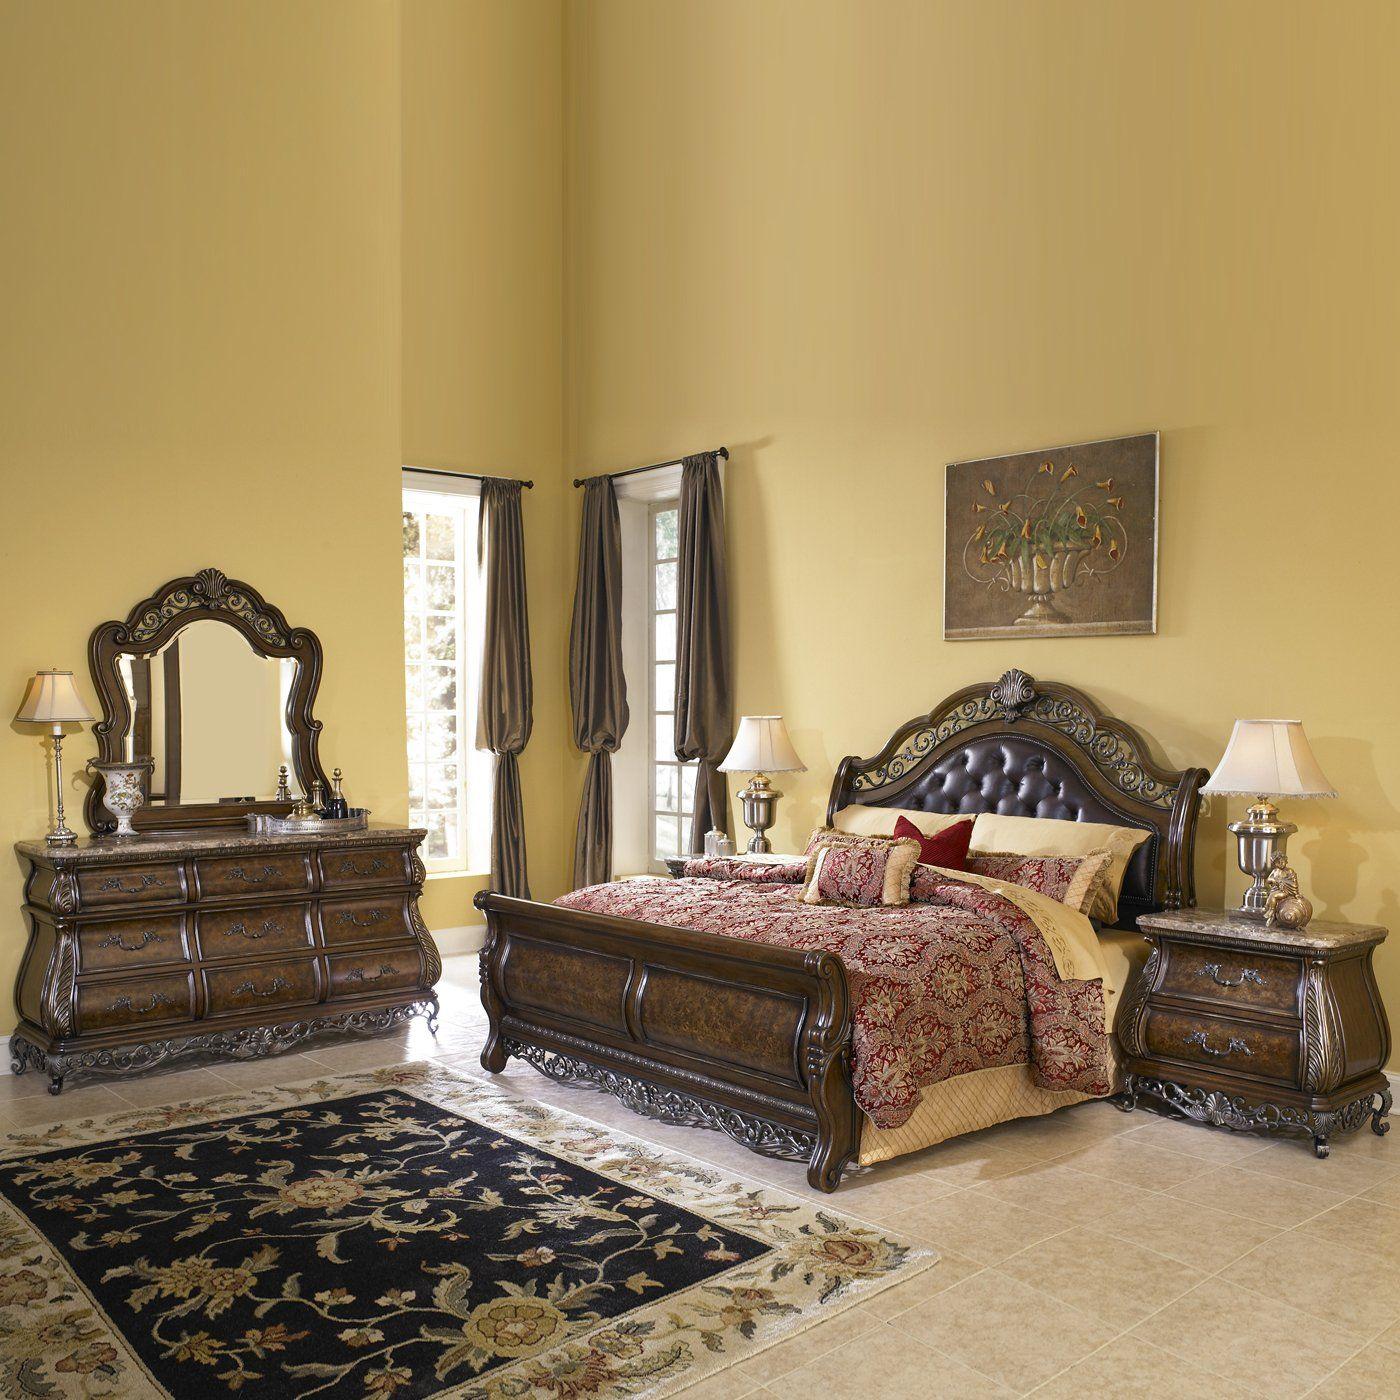 Pulaski furniture sleigh bedroom set birkhaven master suite